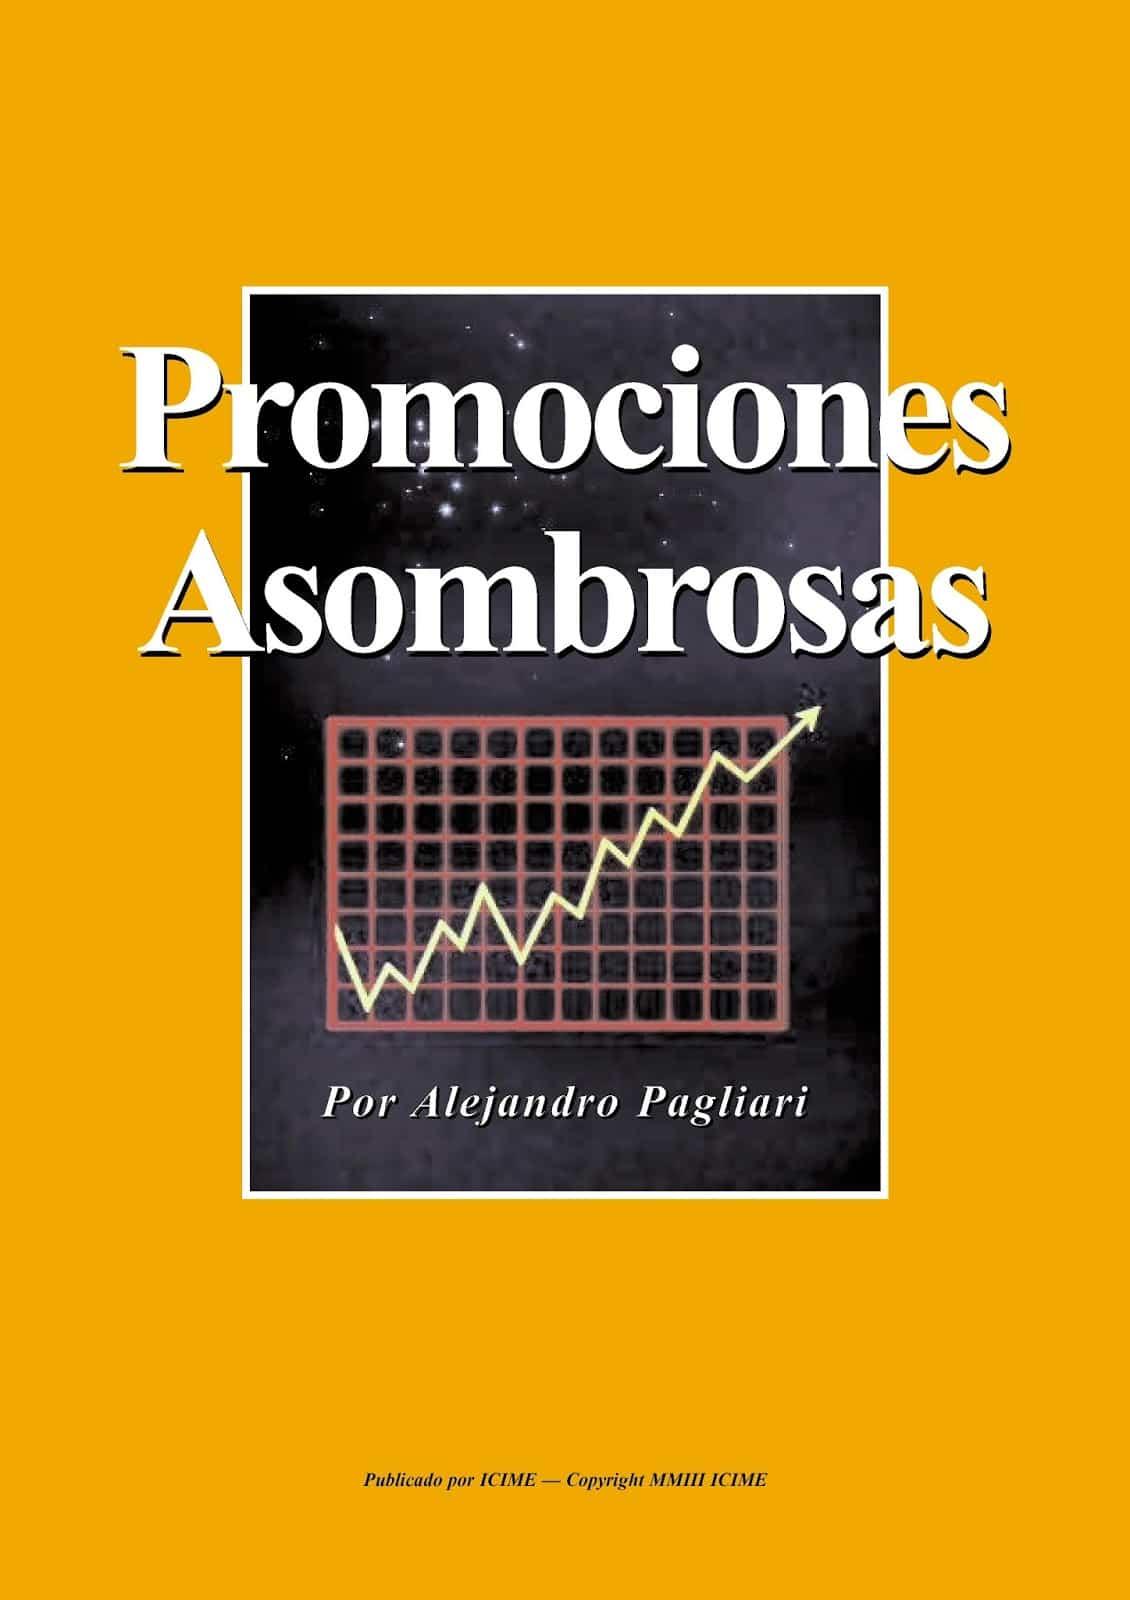 Promociones asombrosas – Alejandro Pagliari